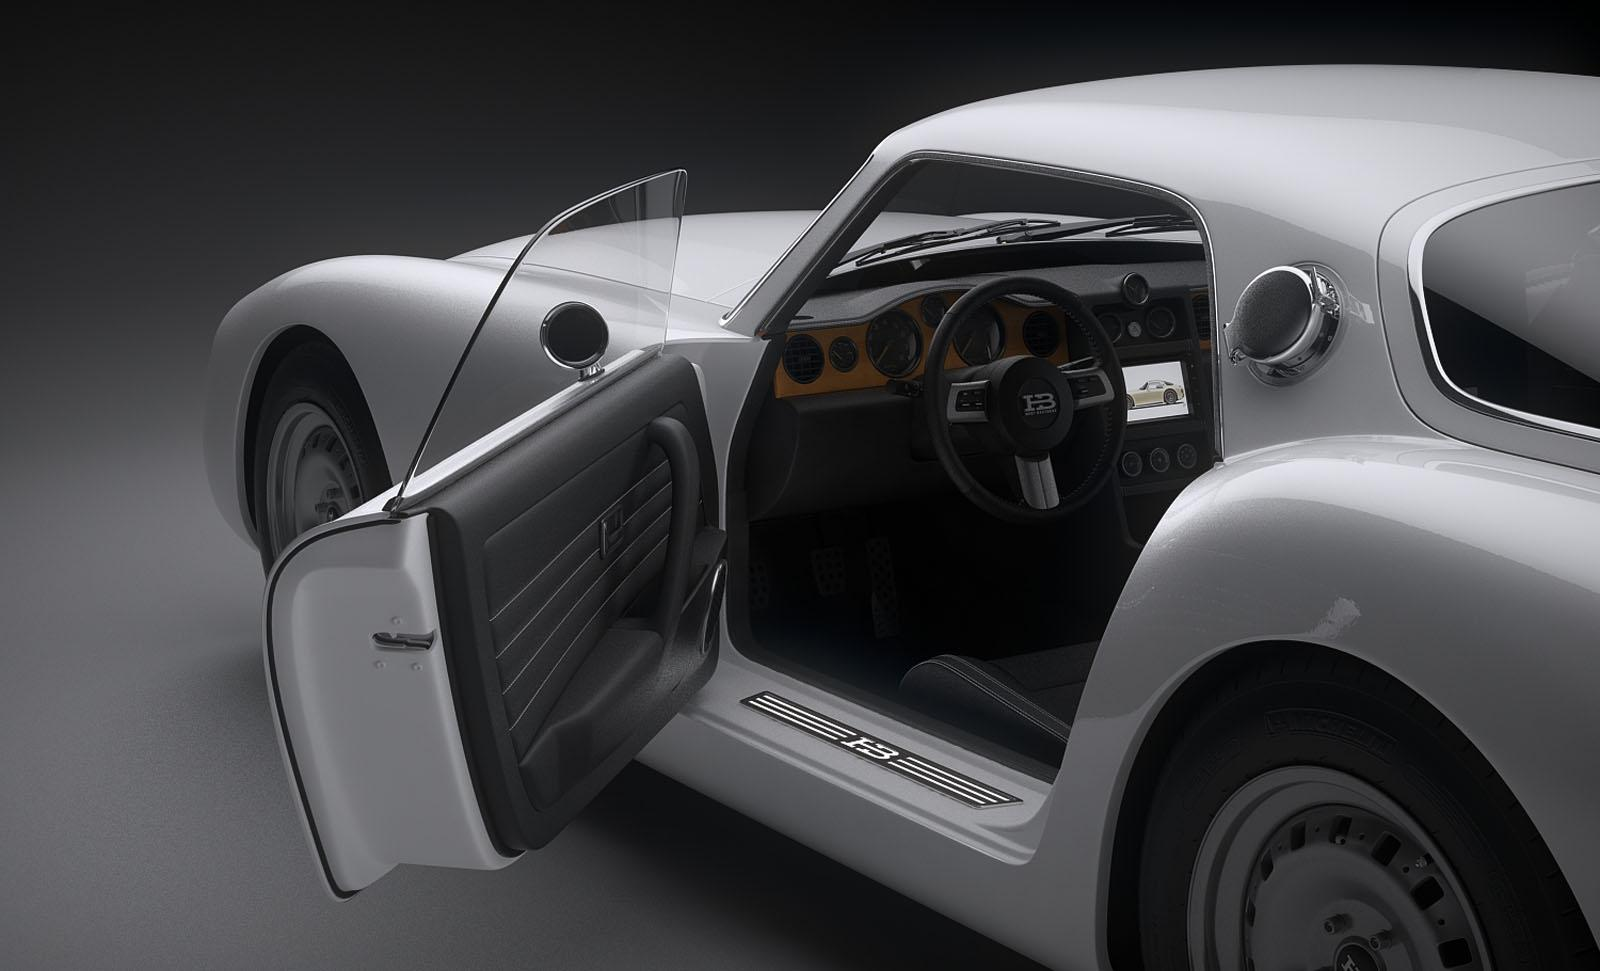 New 2015 Mazda Mx 5 To Become Custom Retro Sports Car By